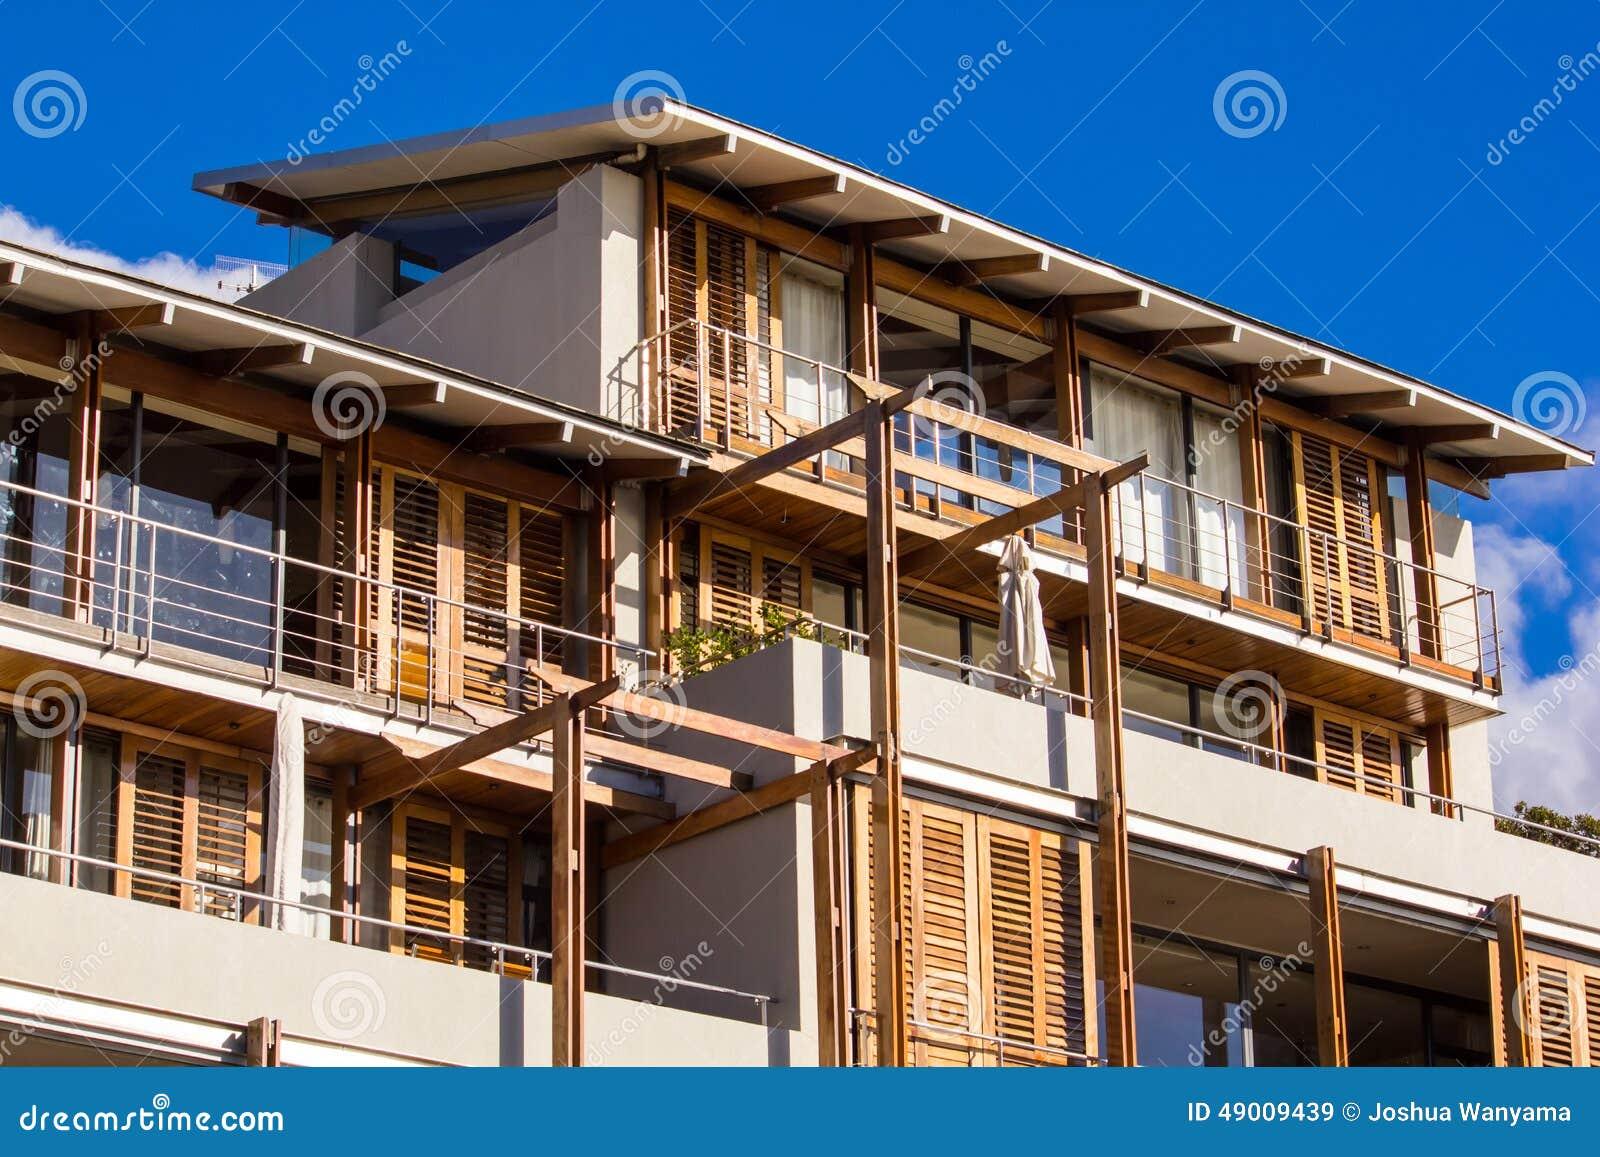 Africa Apartment Balconies Beach Building Cape Modern Nice ... Part 95